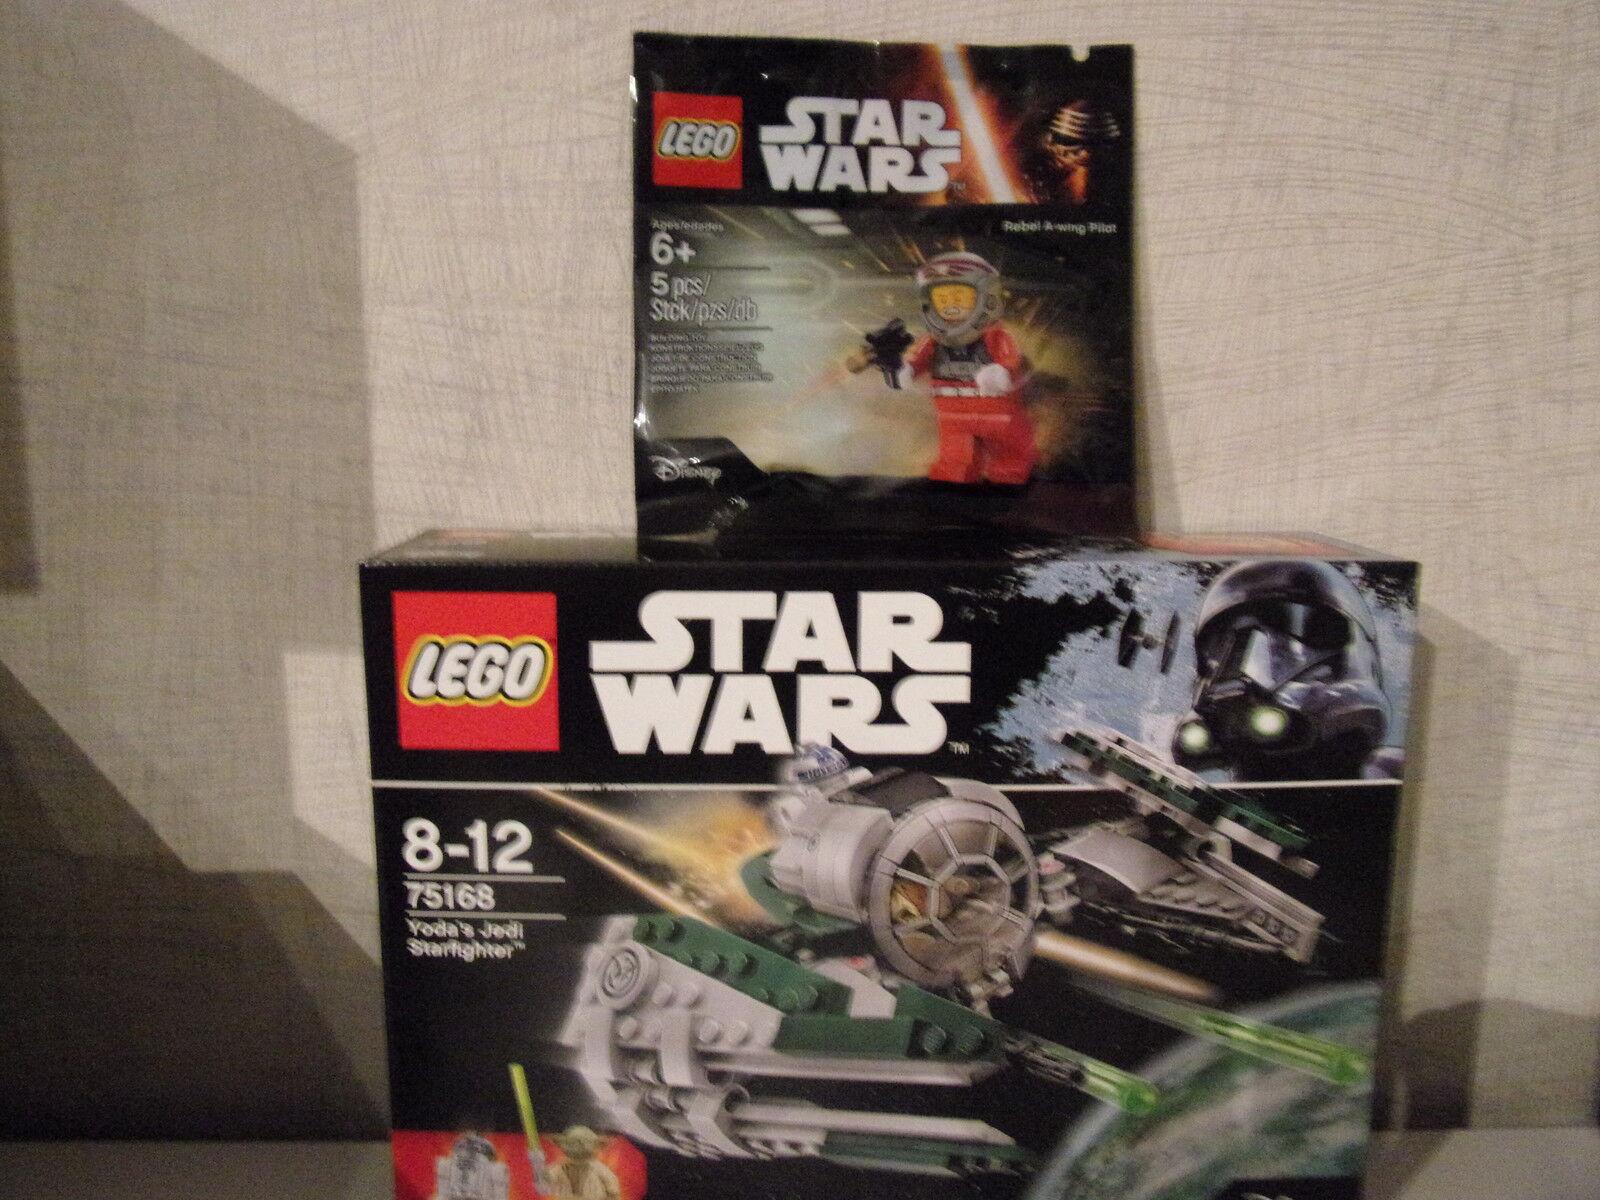 LEGO Star Wars 75168 Yoda 's Jedi stellari  PLUS Rebel 5004408  - NUOVO & OVP